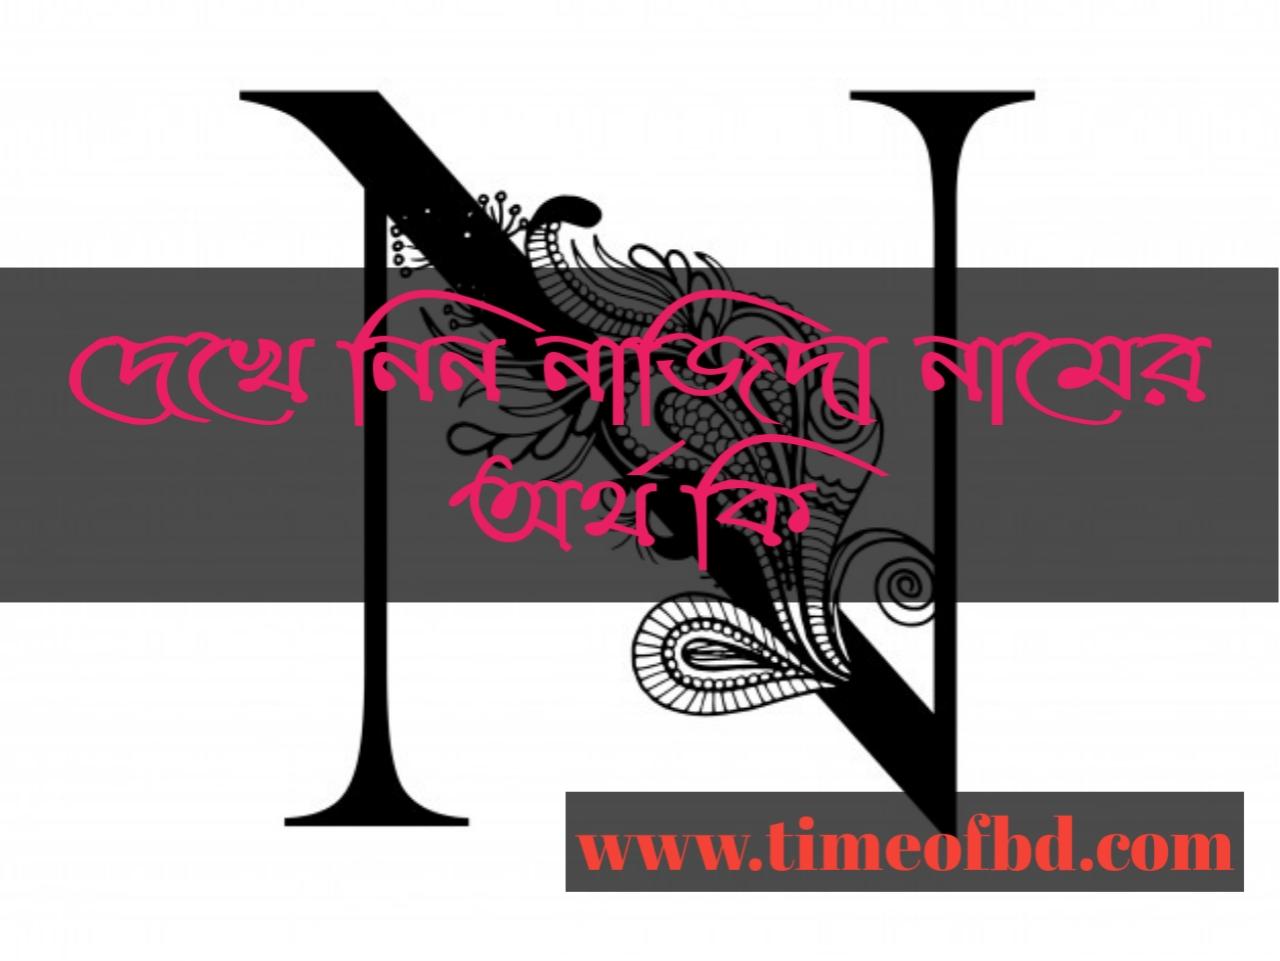 Najida name meaning in Bengali, নাজিদা নামের অর্থ কি, নাজিদা নামের বাংলা অর্থ কি, নাজিদা নামের ইসলামিক অর্থ কি,